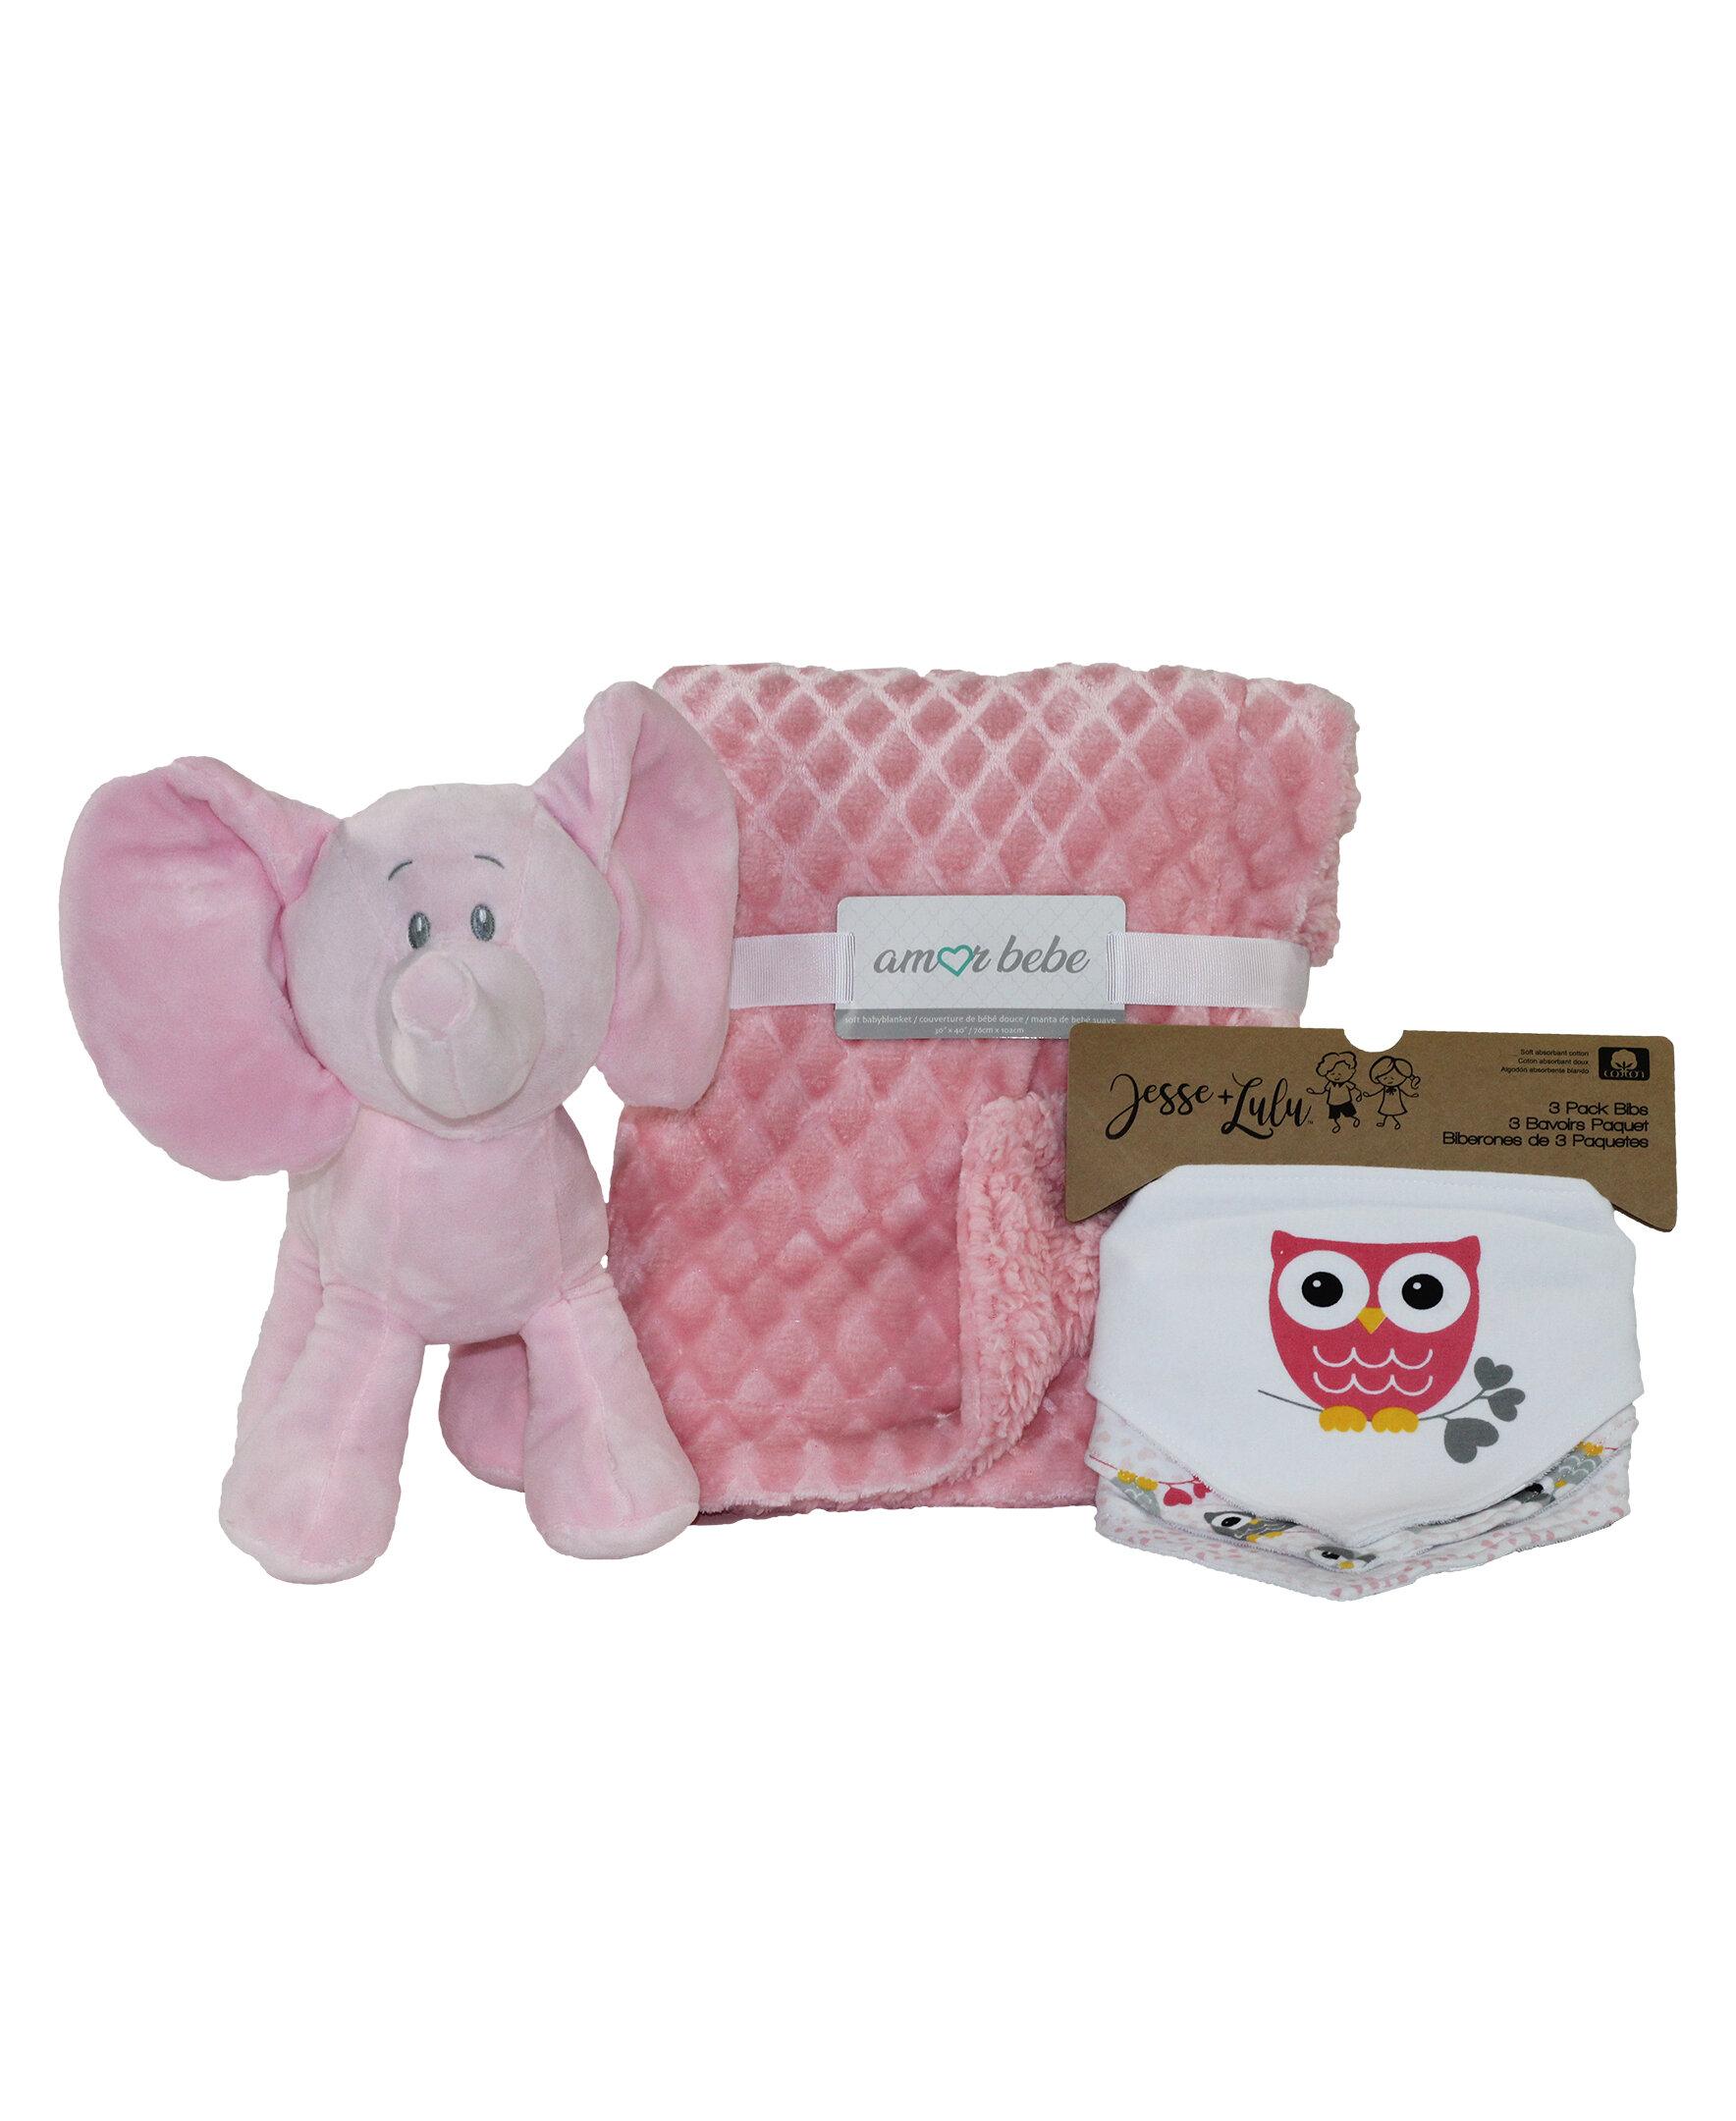 Zoomie Kids Sullivan 5 Piece Plush Elephant Baby Blanket Set Wayfair Ca